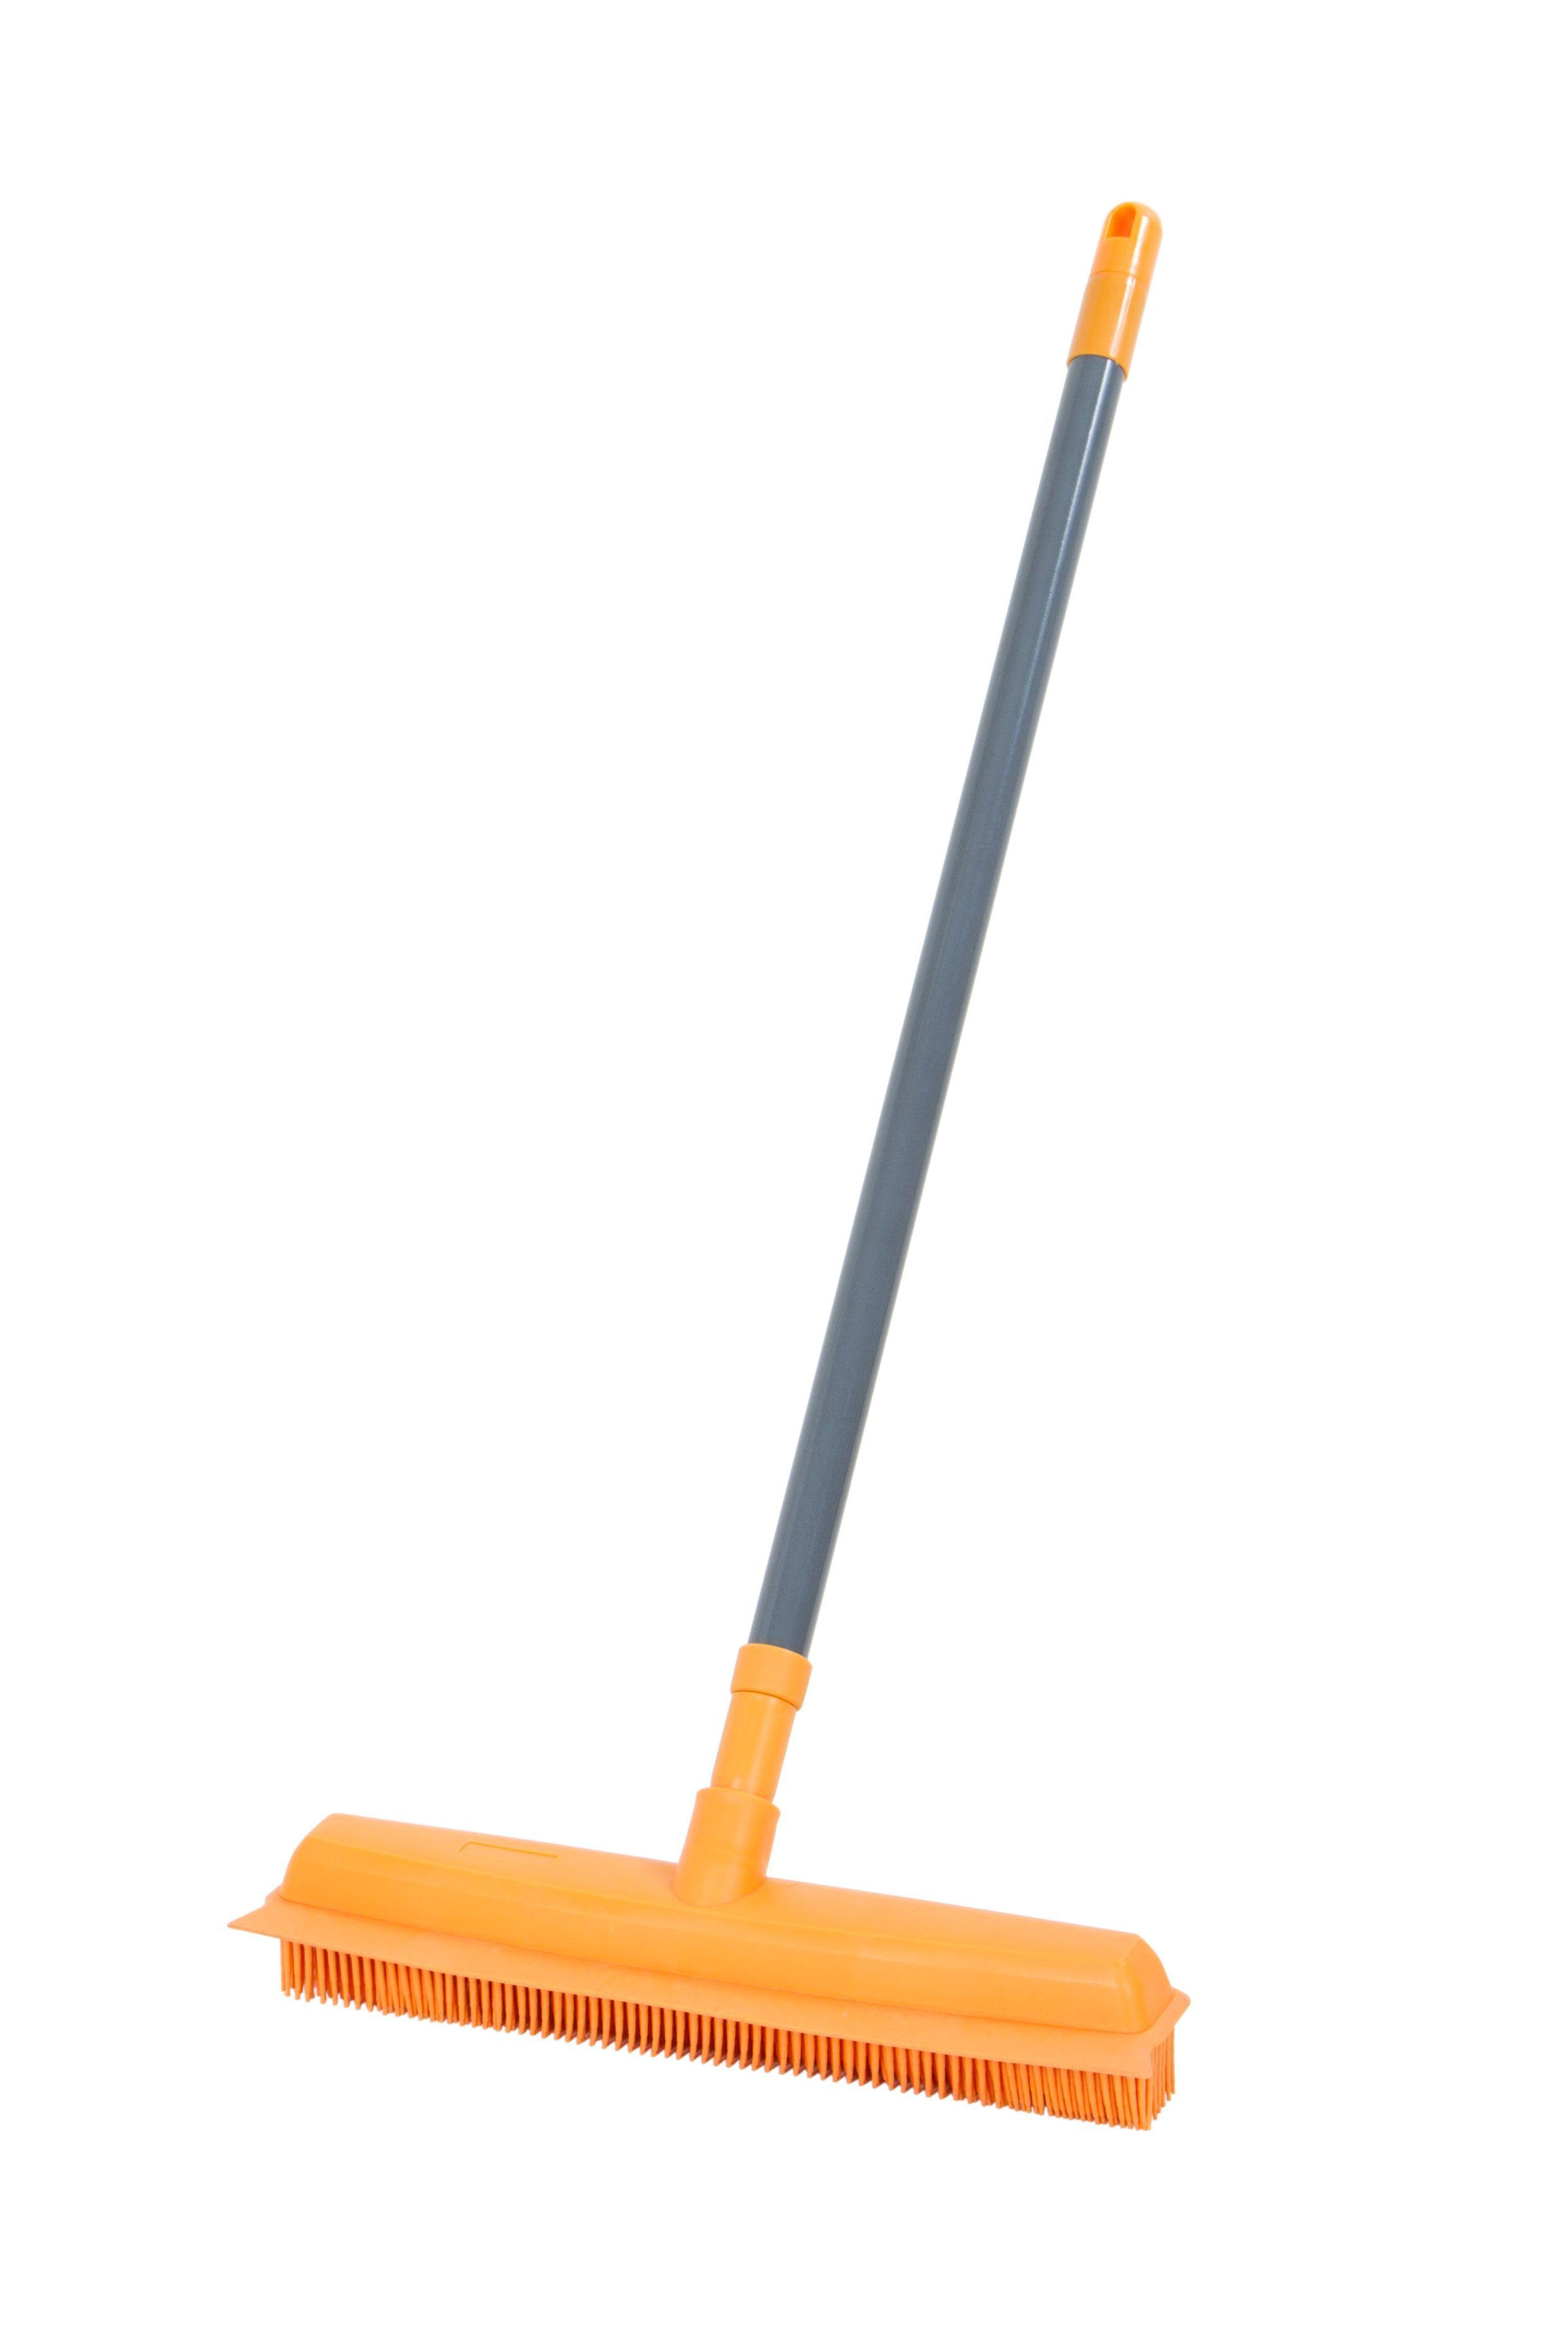 Rubber Broom W 325mm Departments Diy At B Amp Q